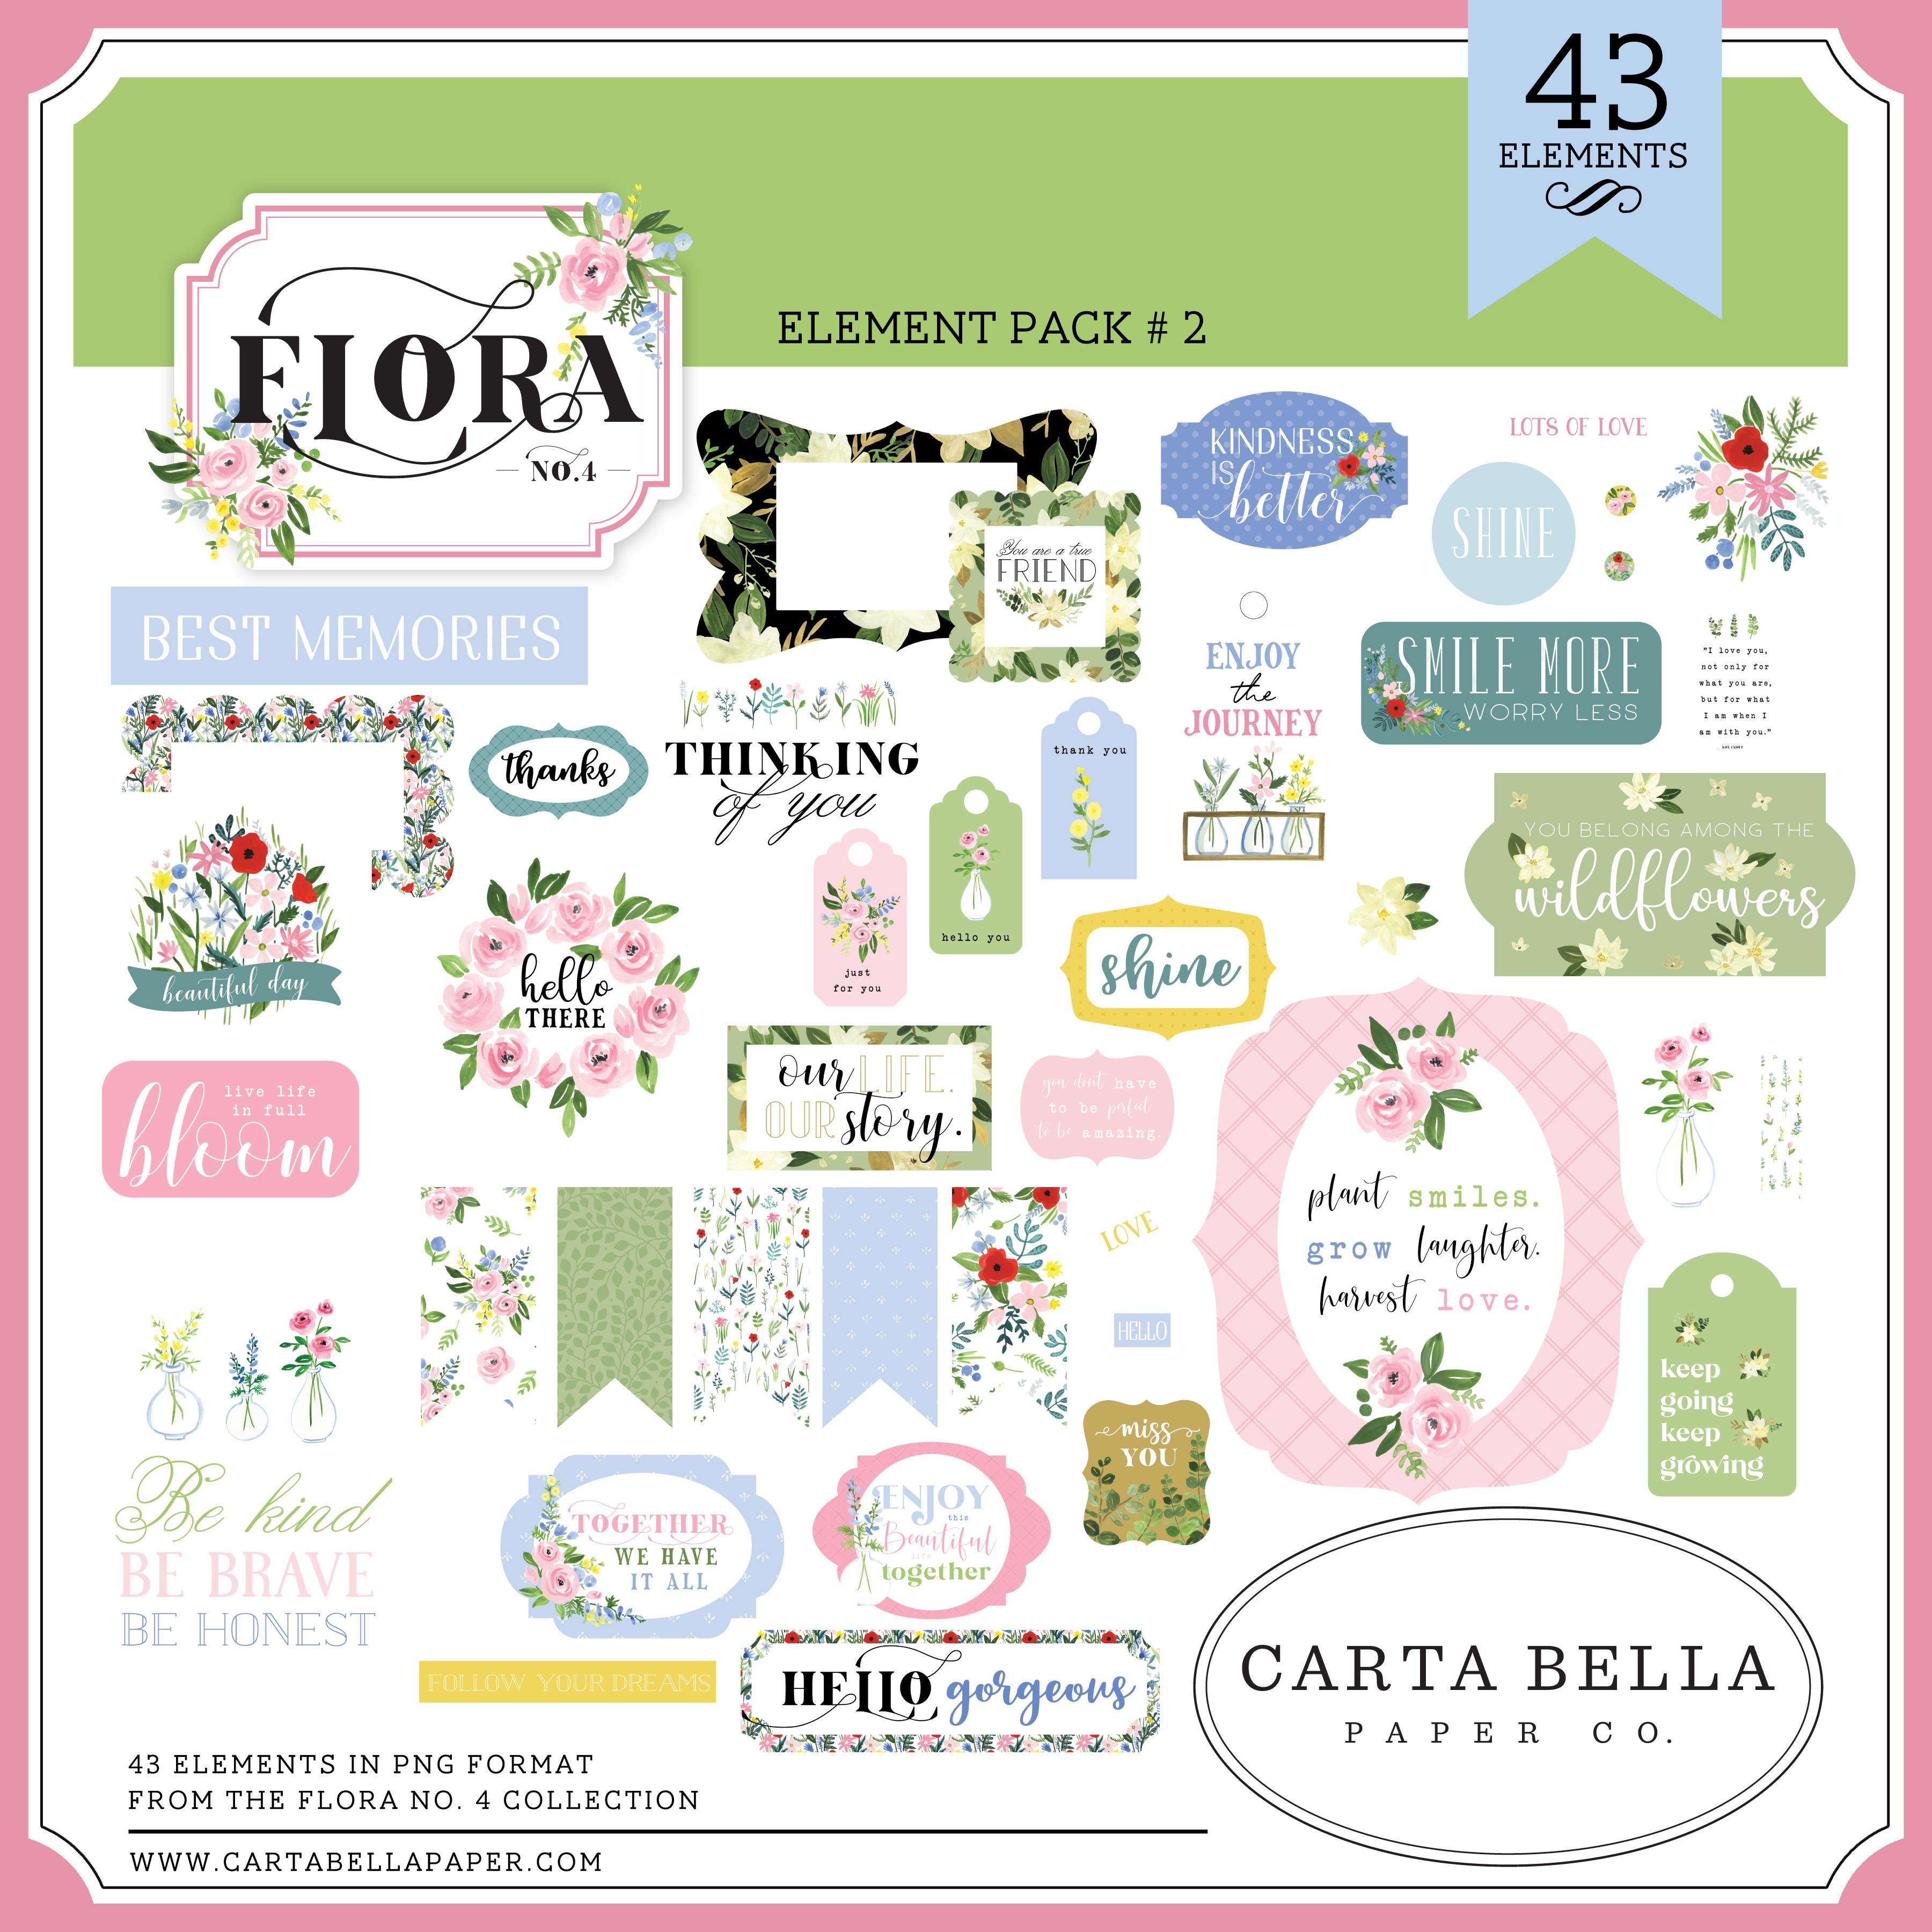 Flora No. 4 Element Pack #2